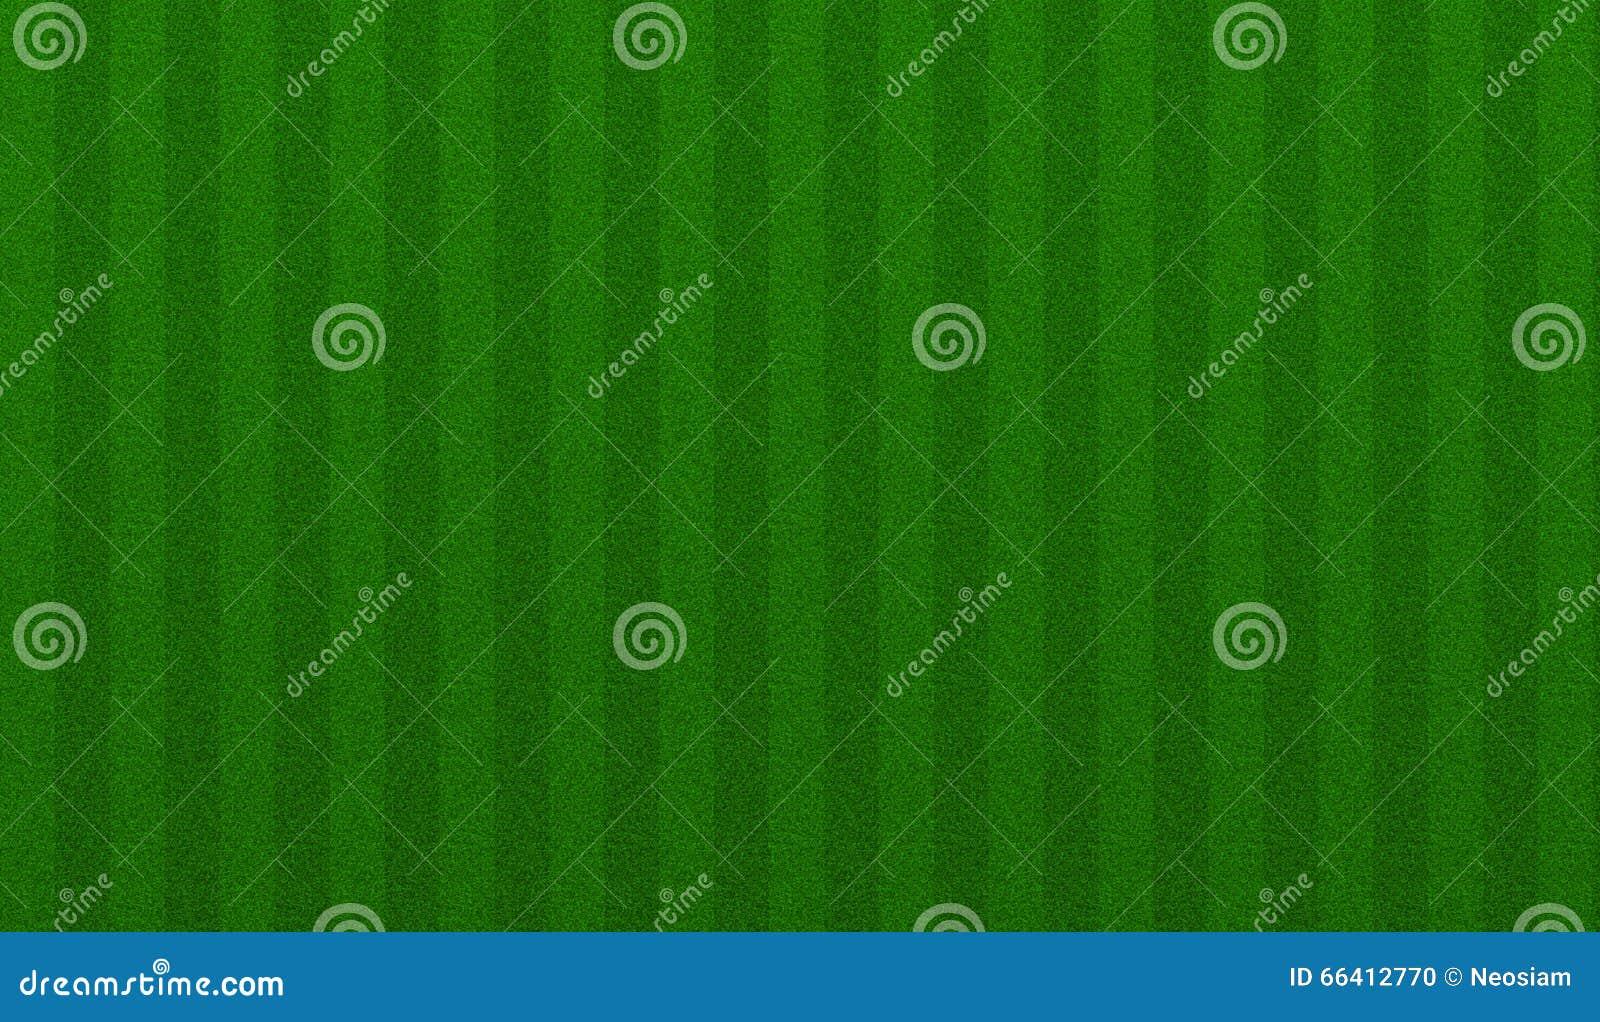 Football Field Stock Illustration Illustration Of Minimal 66412770